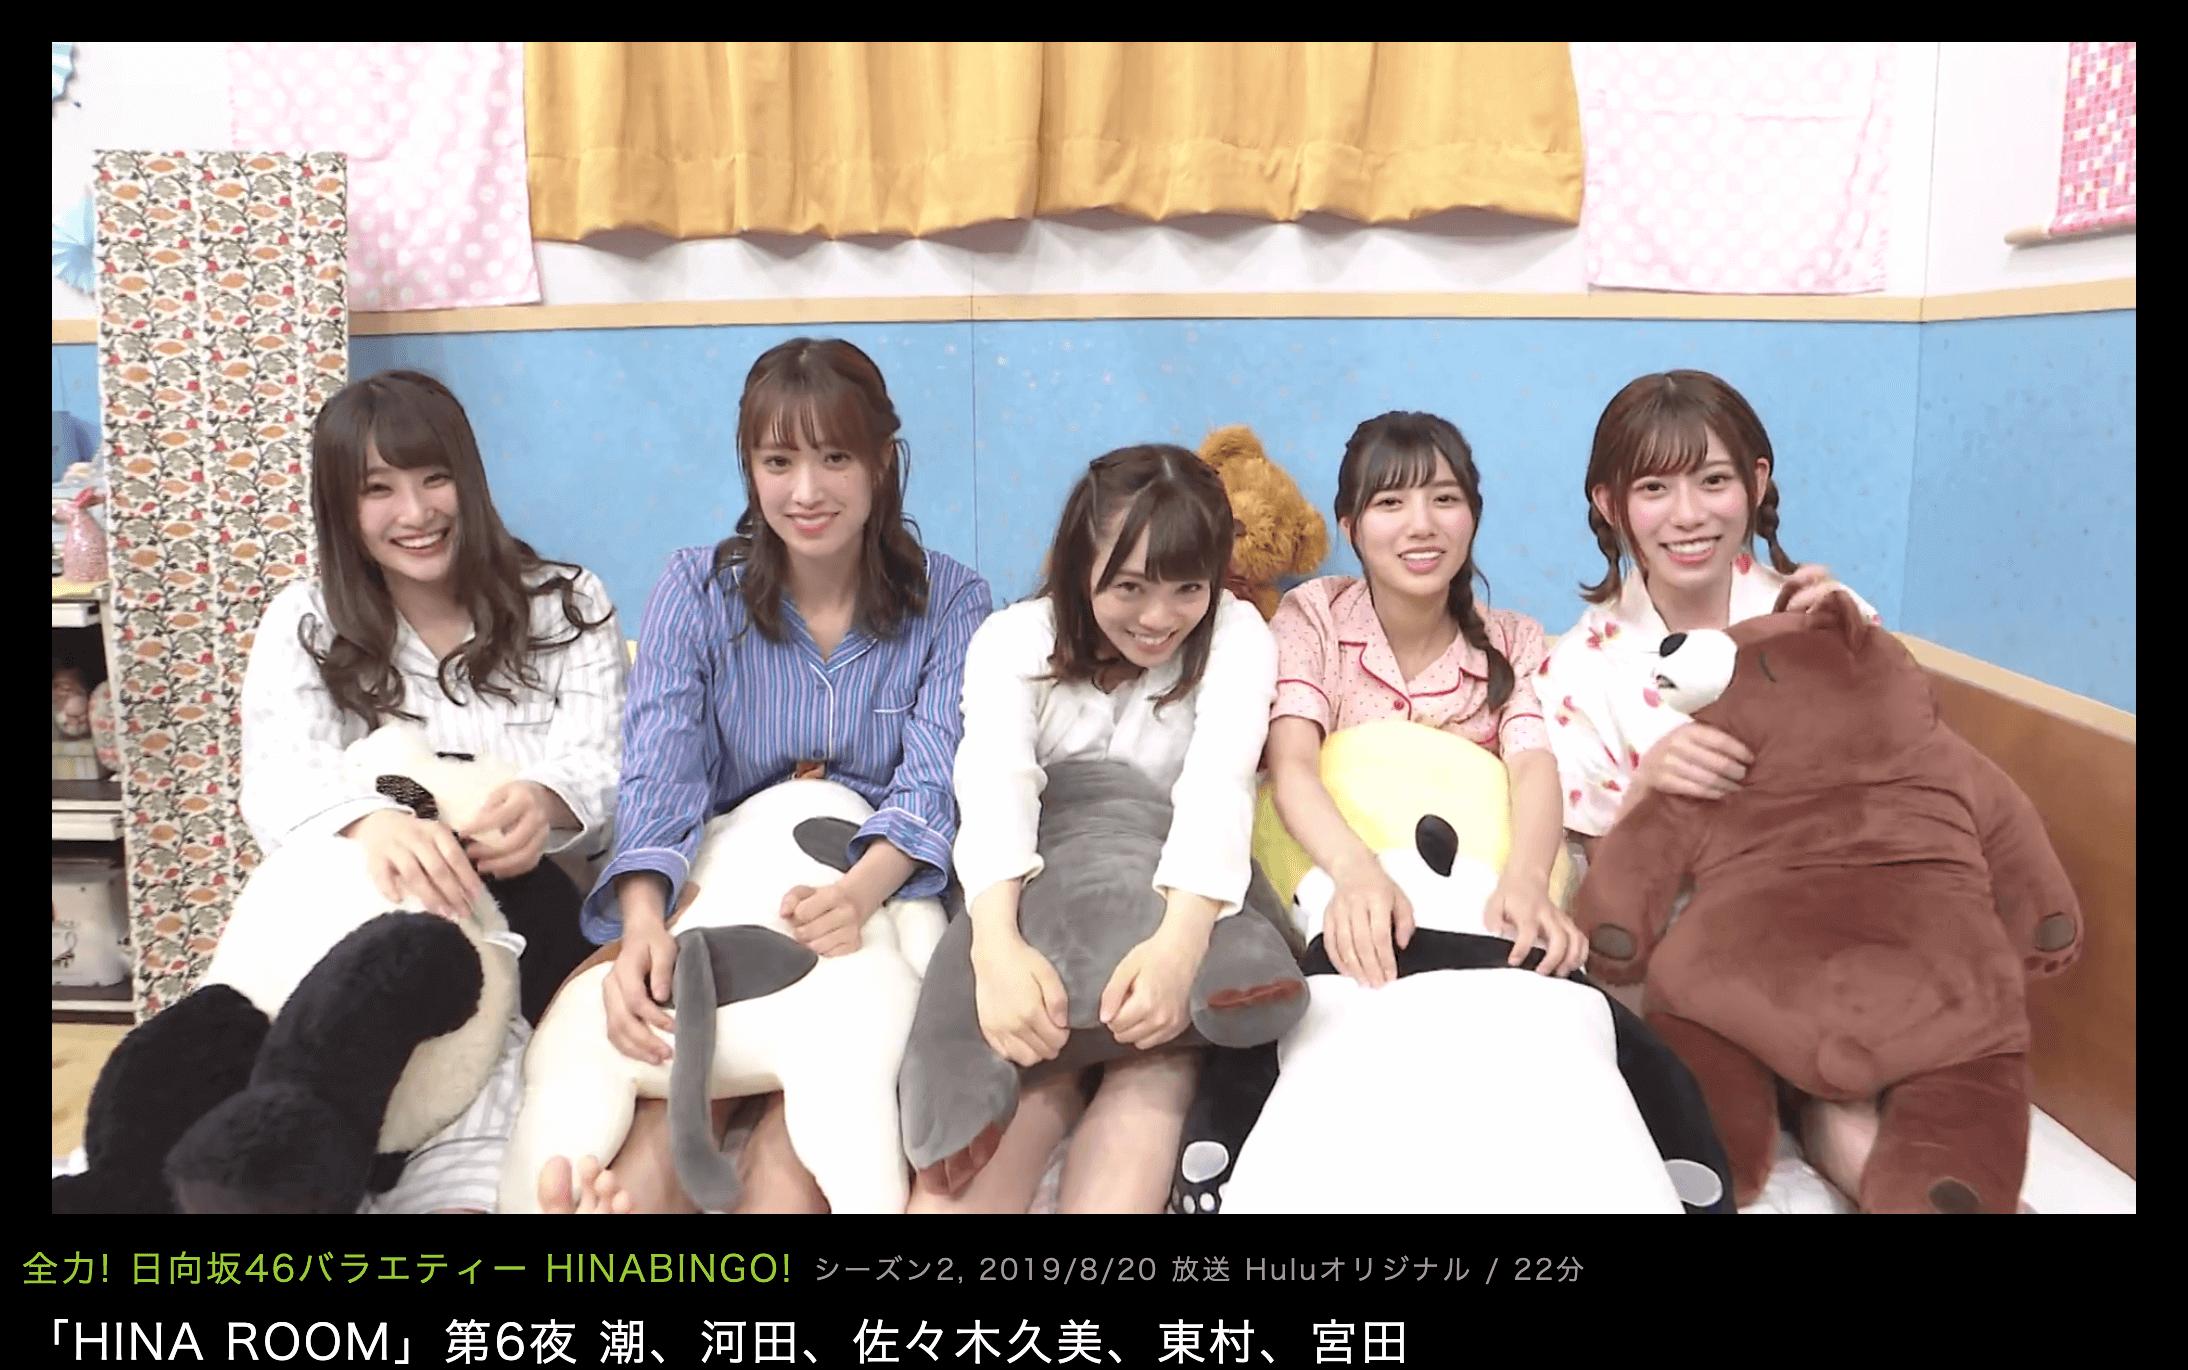 hinabingo2第6話のhinaroom画像